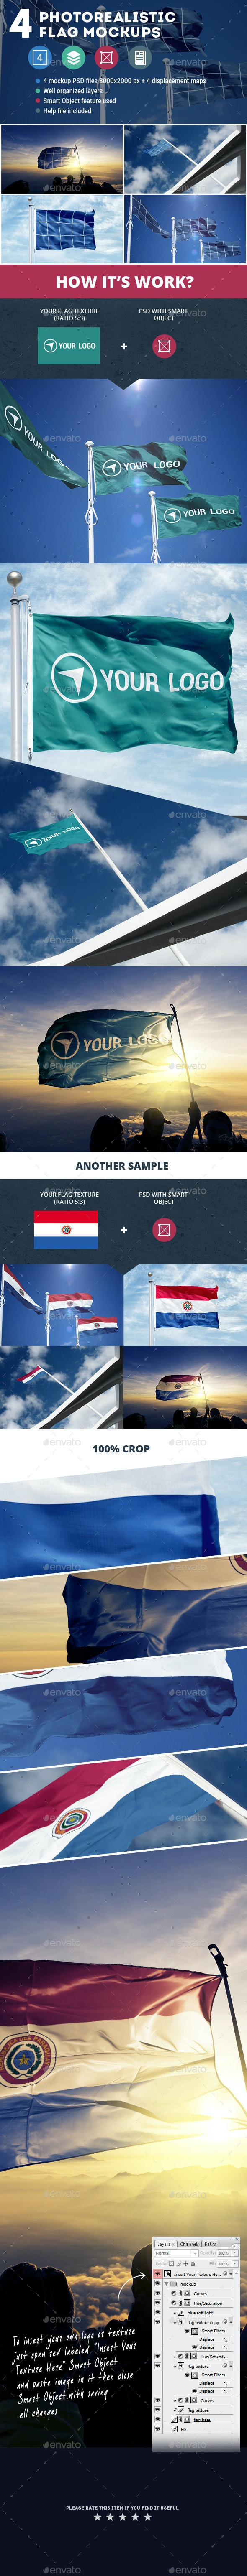 4 Photorealistic Flag Mockups - Miscellaneous Product Mock-Ups